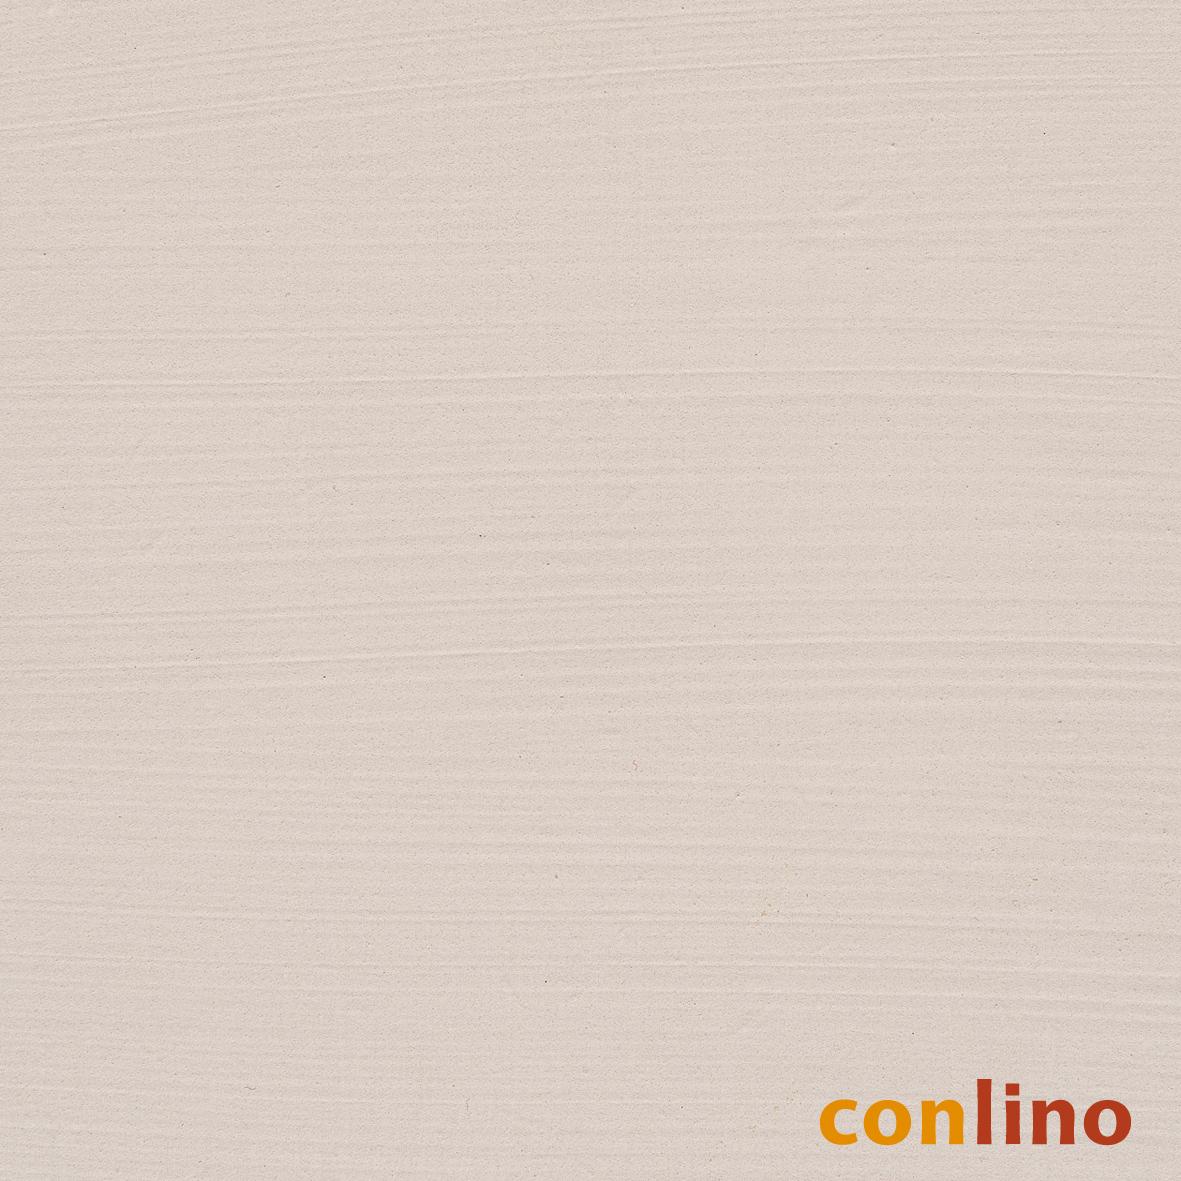 conluto Lehmfarbe Bilbao CL 105